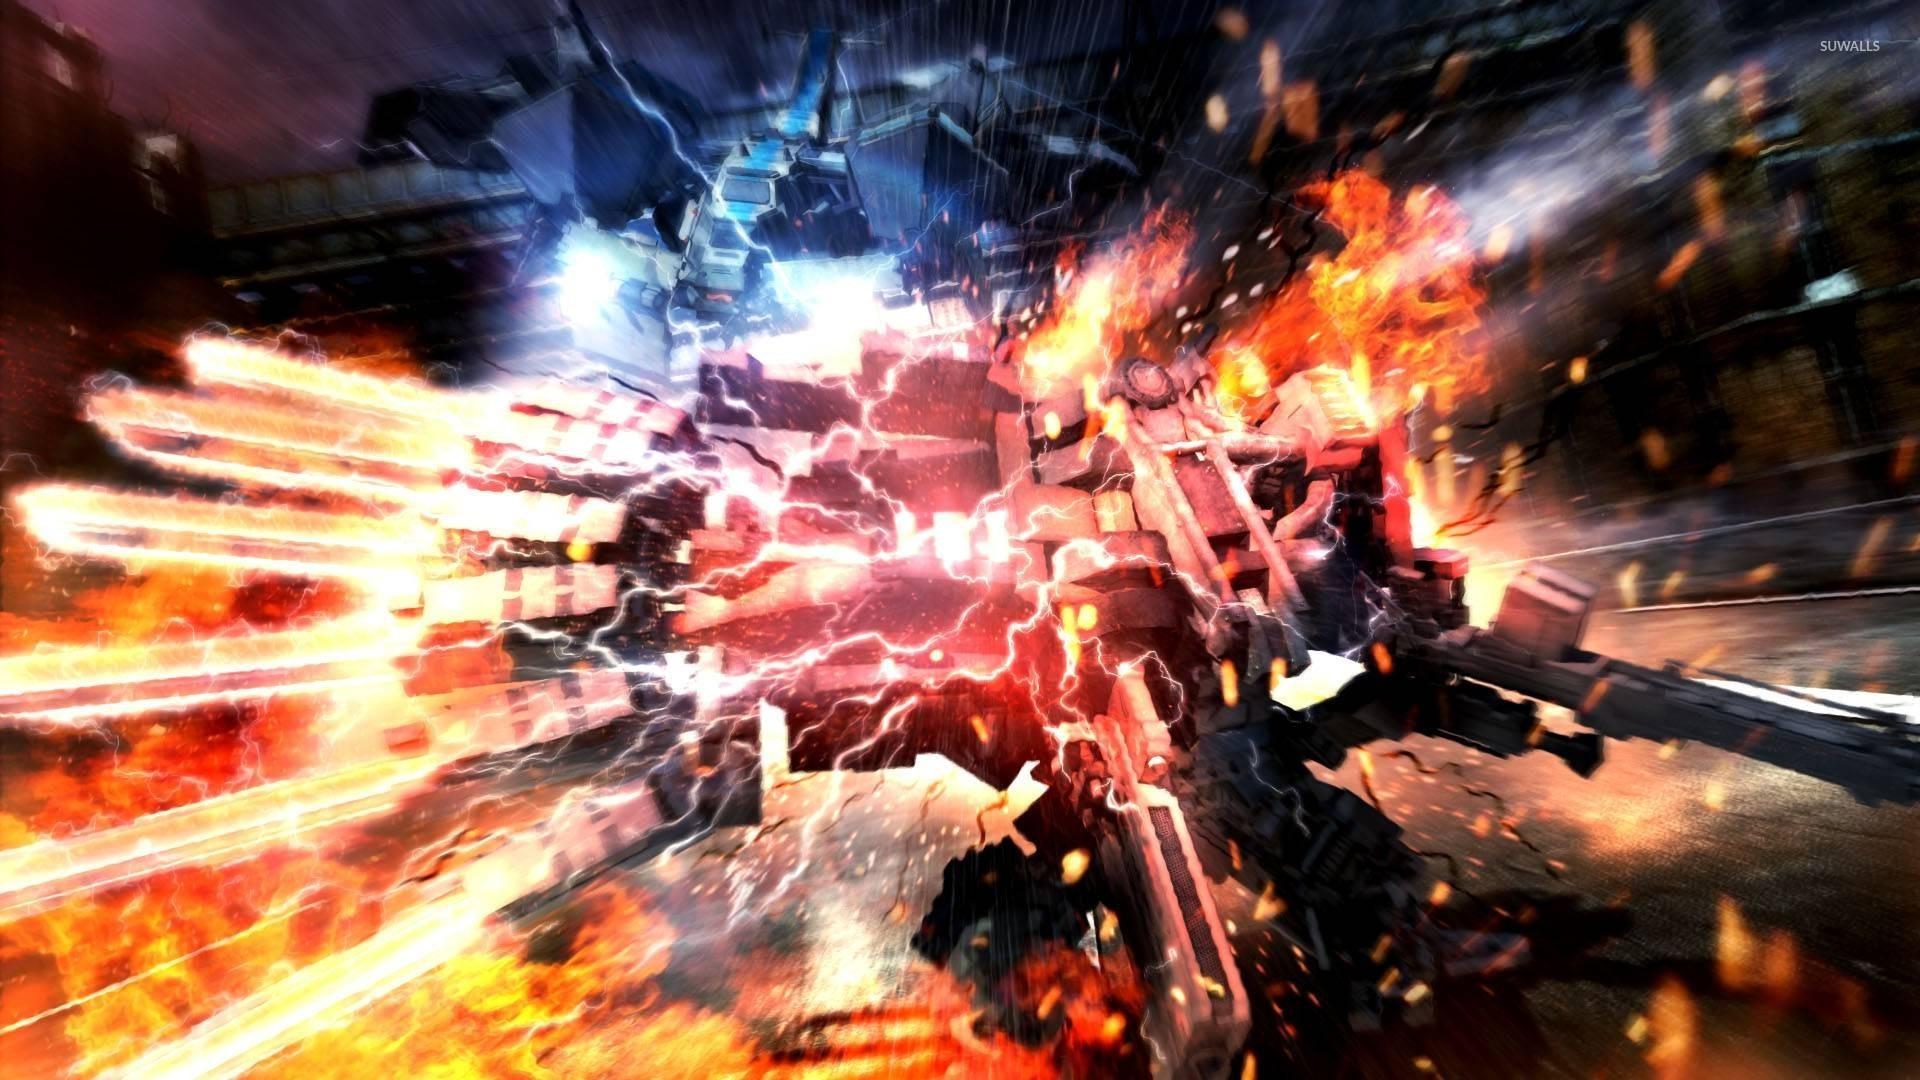 Malzel - Armored Core V wallpaper - Game wallpapers - #24848